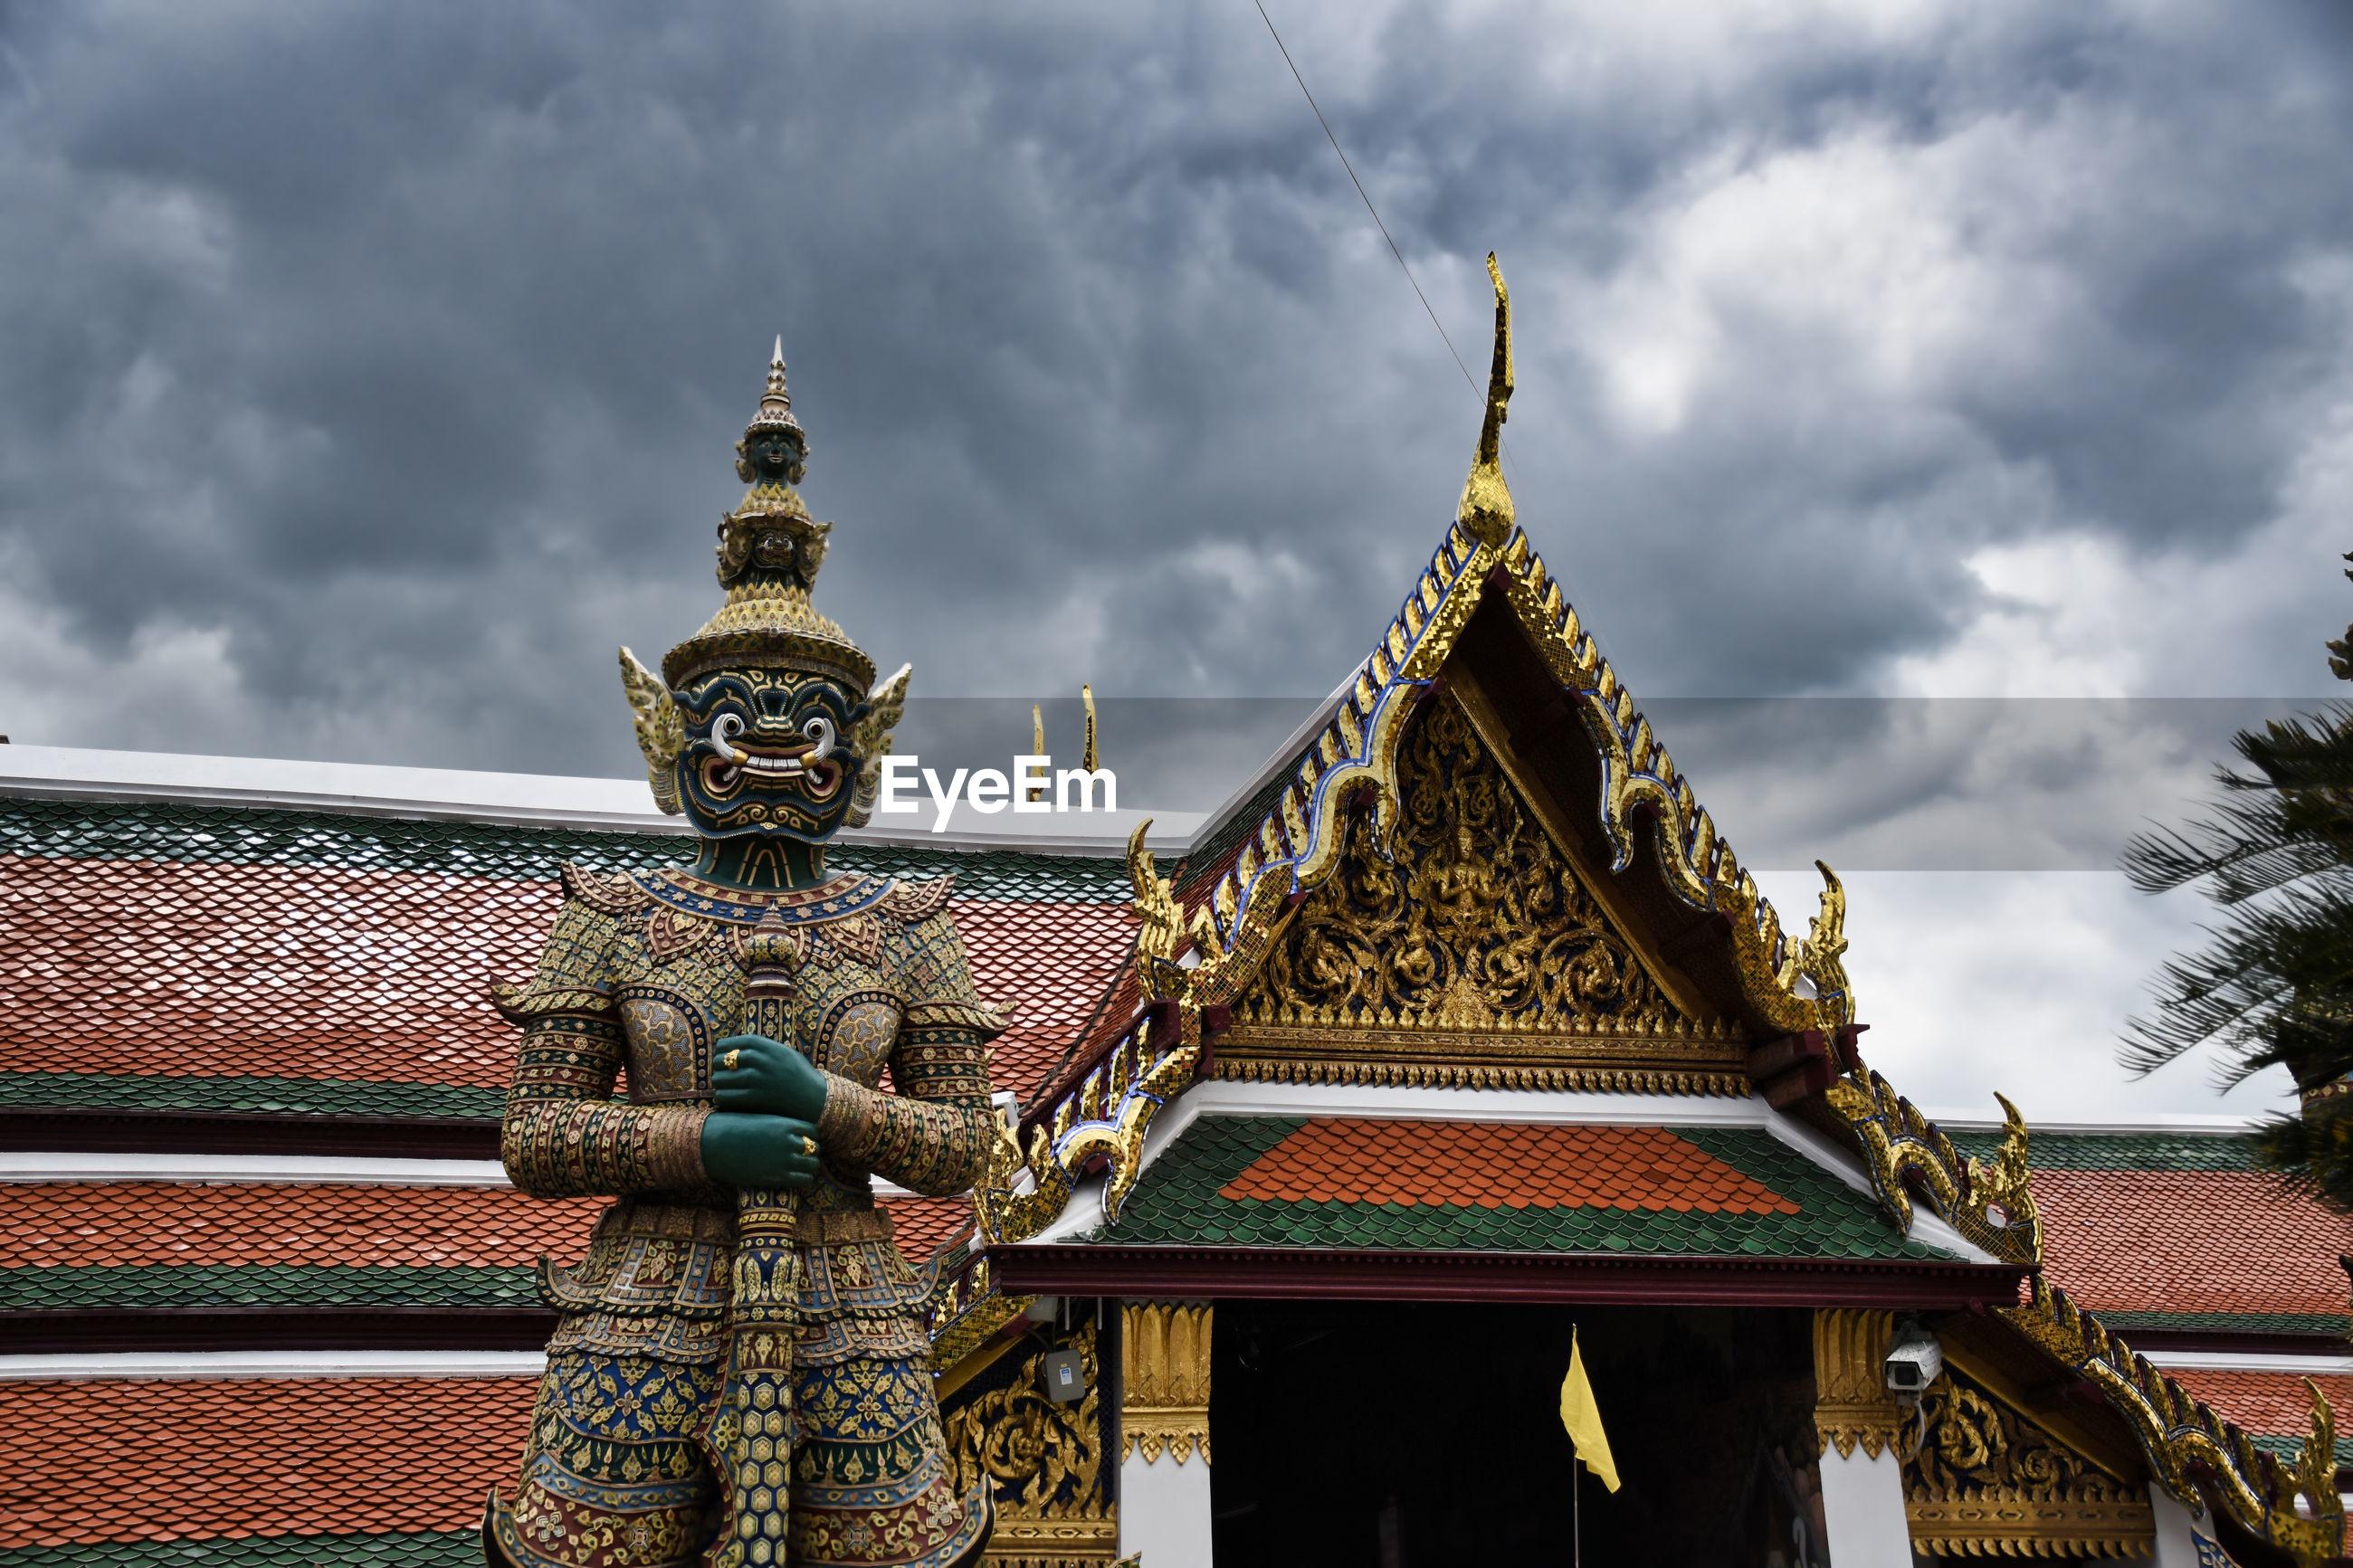 Giant yak, yaksha statue with large teeth, piercing eye with sword in hand